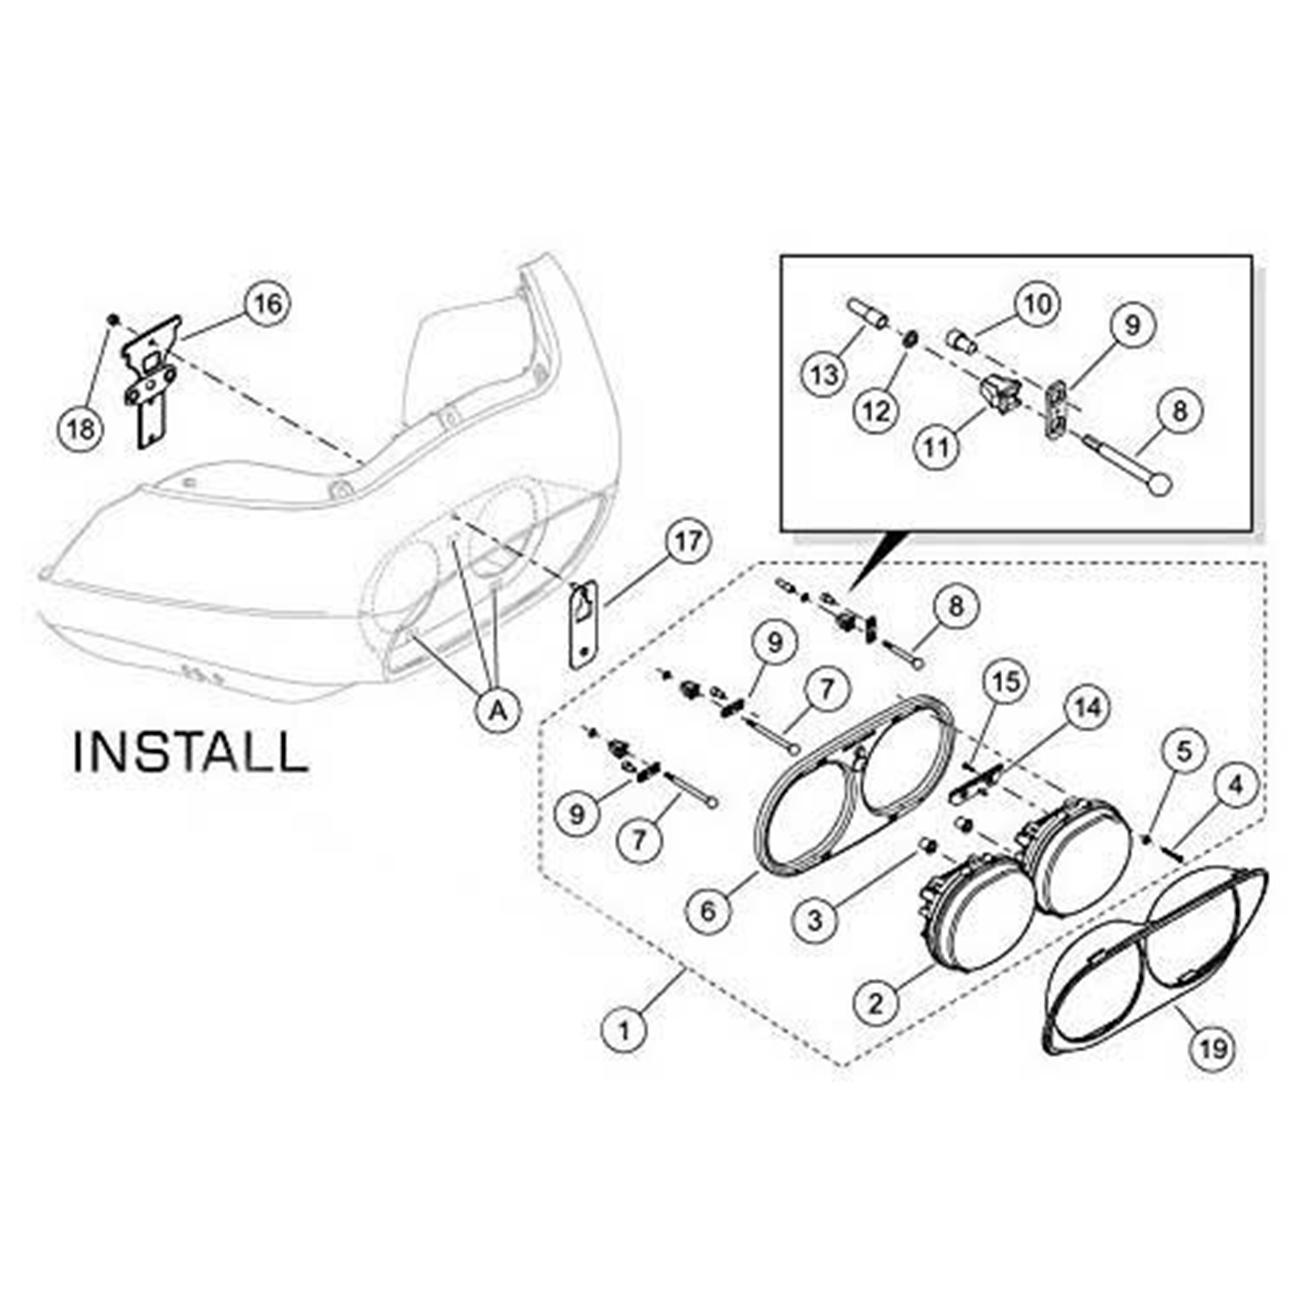 Daymaker Projector Dual Led Headlight For Harley Davidson Road Glide Headlamp